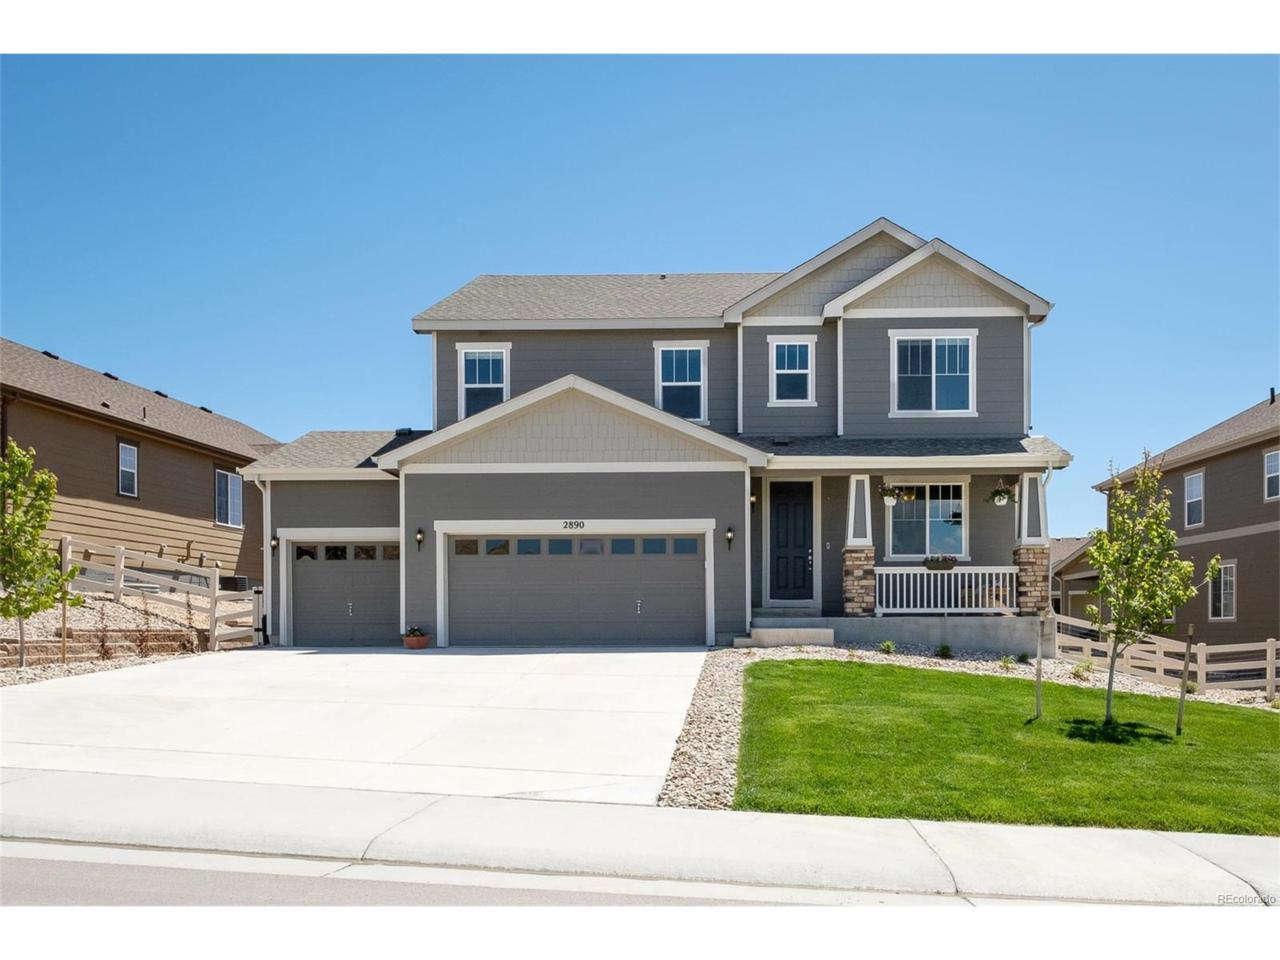 2890 Echo Park Drive, Castle Rock, CO 80104 (MLS #7642859) :: 8z Real Estate